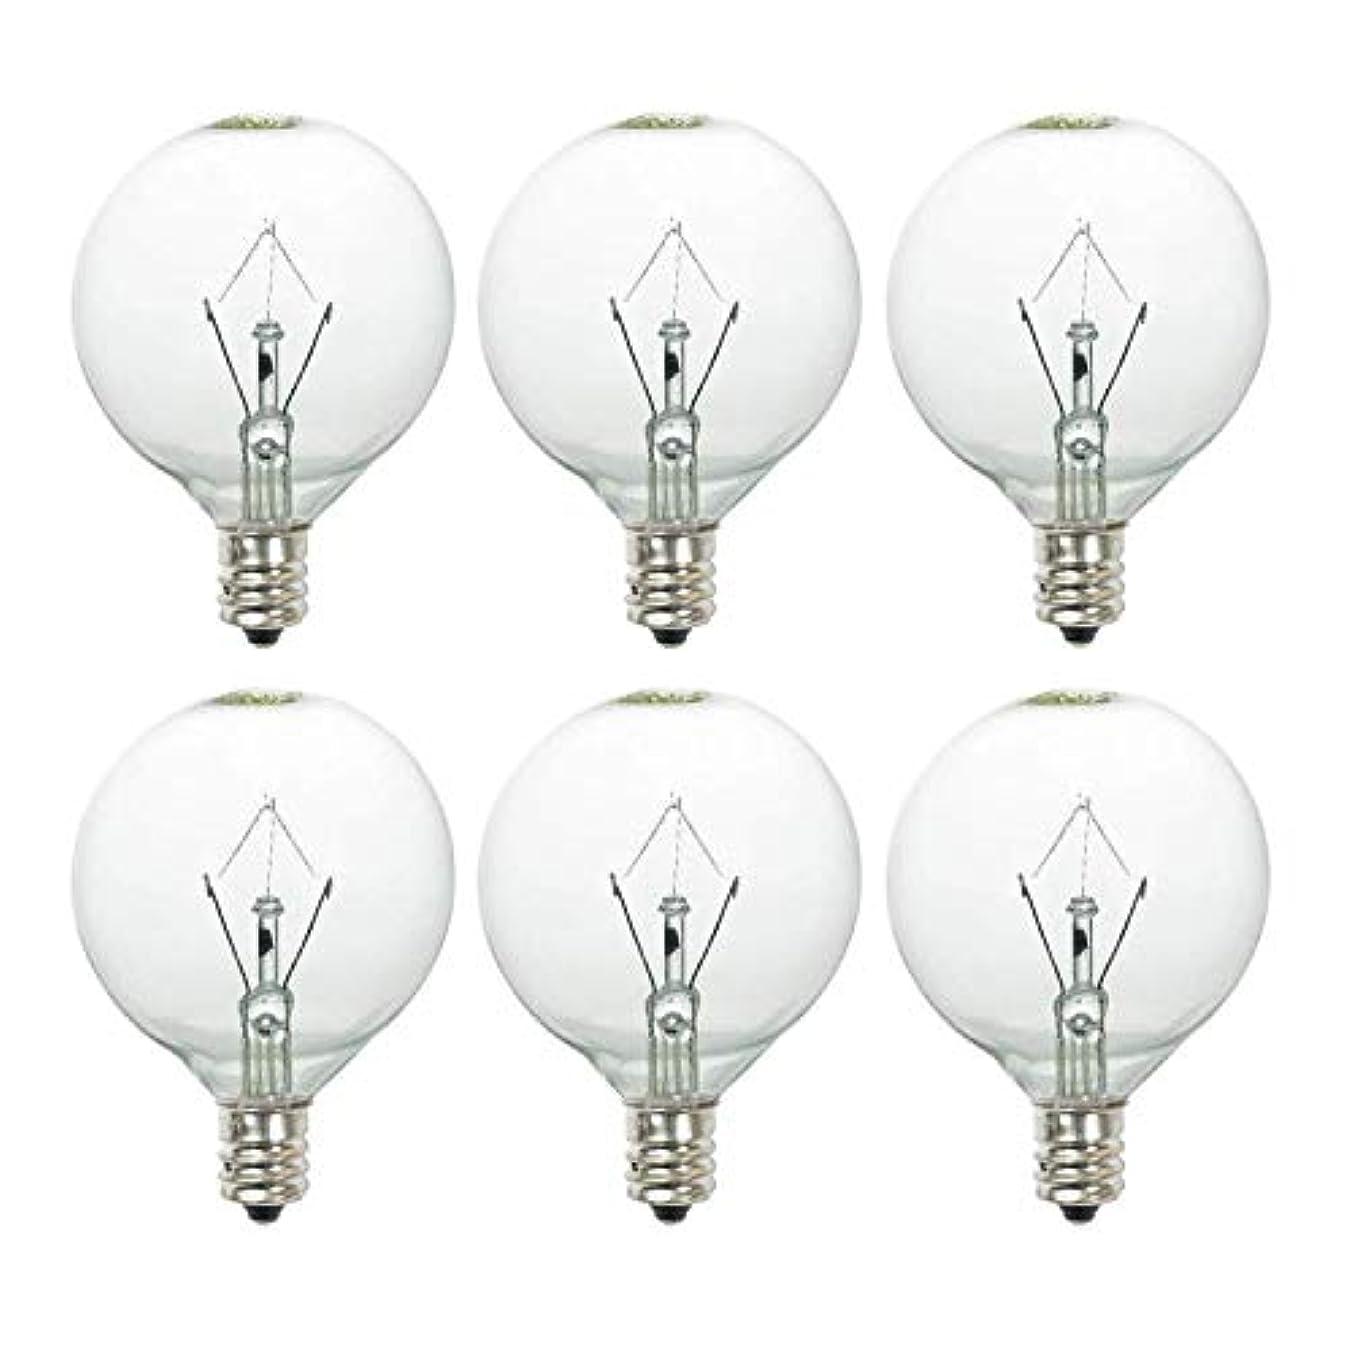 25 Watt Wax Melt Warmer Light Bulb for Full-Size Scentsy Warmers & Candle Wax Melt Warmer,6 Pack Scentsy Warmer Bulbs,Extra Long Life